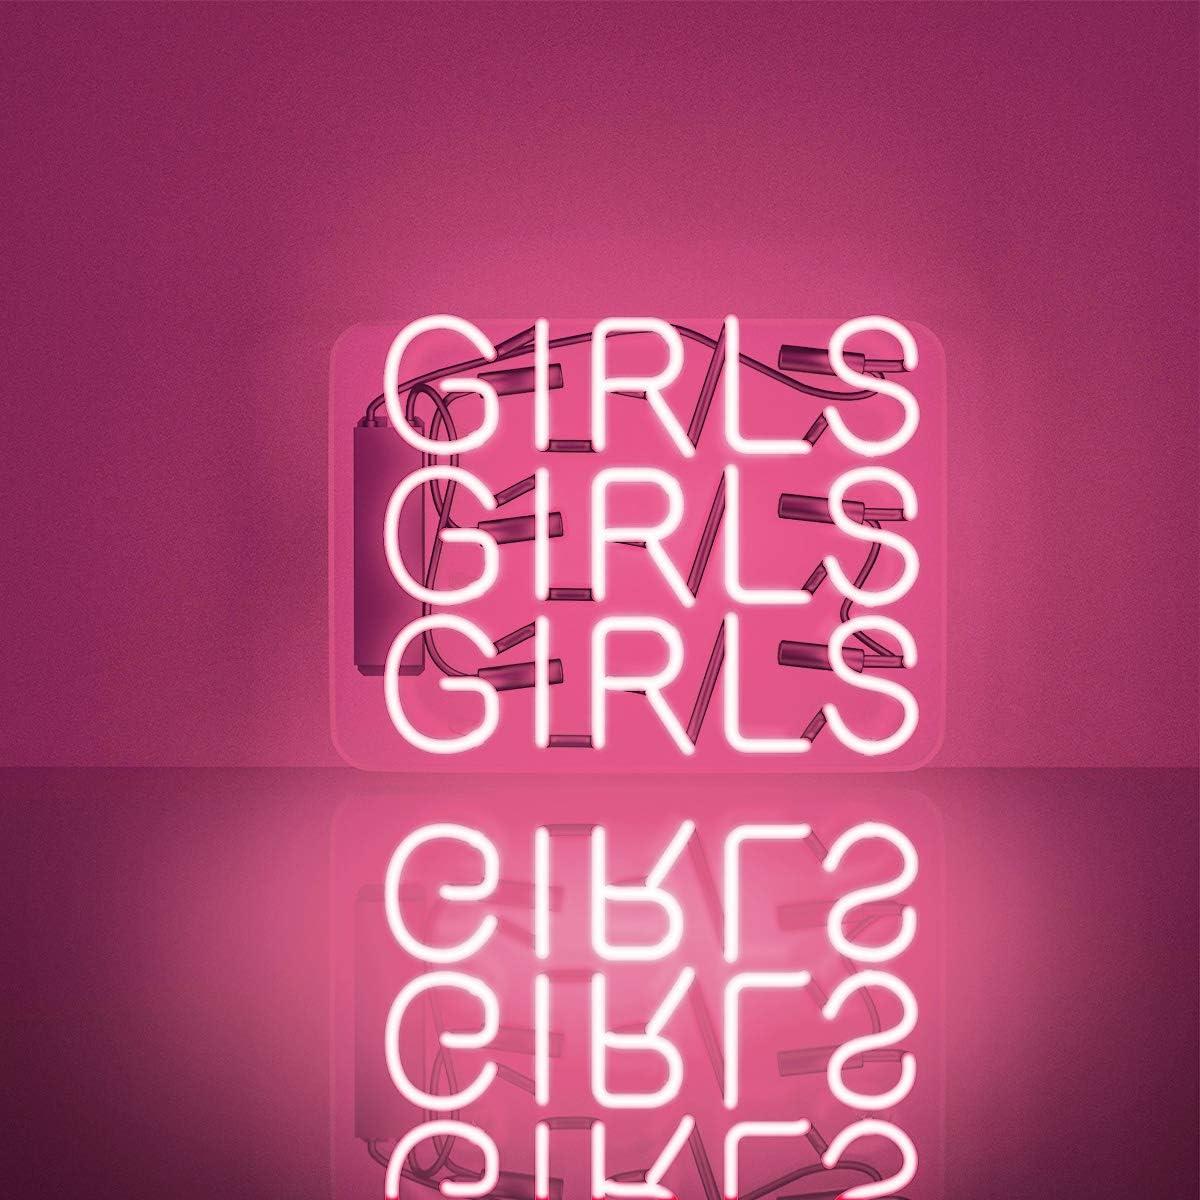 "Neon Sign, Handmade Glass Girls Girls Girls Neon Signs Ultra Bright Pink Neon Light 3D Visual Effect Decorative Sign Novelty Neon Night Light for Man Cave Room Bedroom Office Bar Wall Decor 12""x10"""